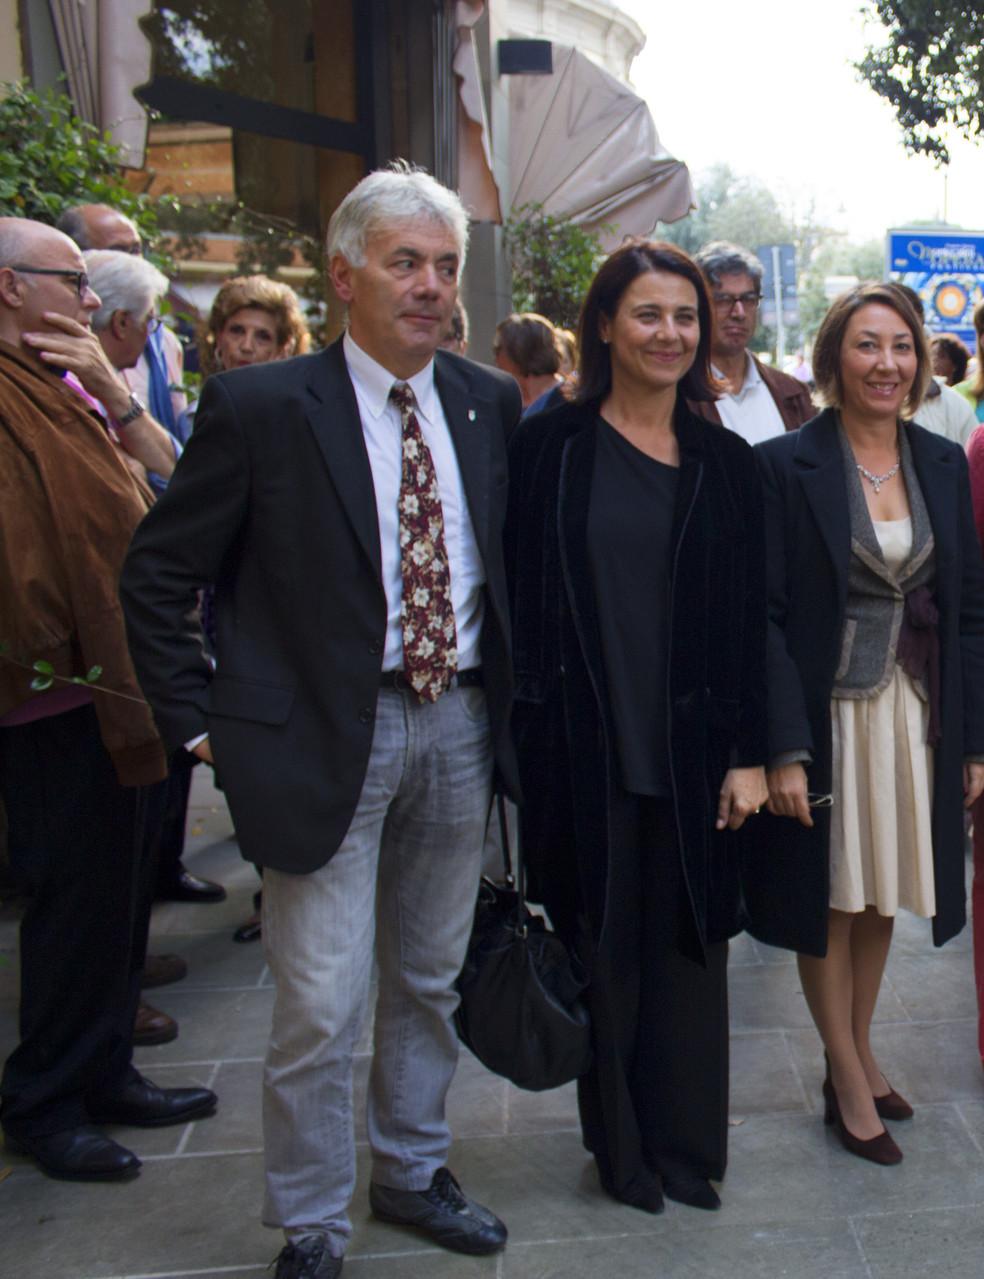 Bruno Ialuna (Assessore alla Cultura di Montecatini Terme), Stefania Ippoliti (Mediateca ed Area Cinema), Barbara Enrichi